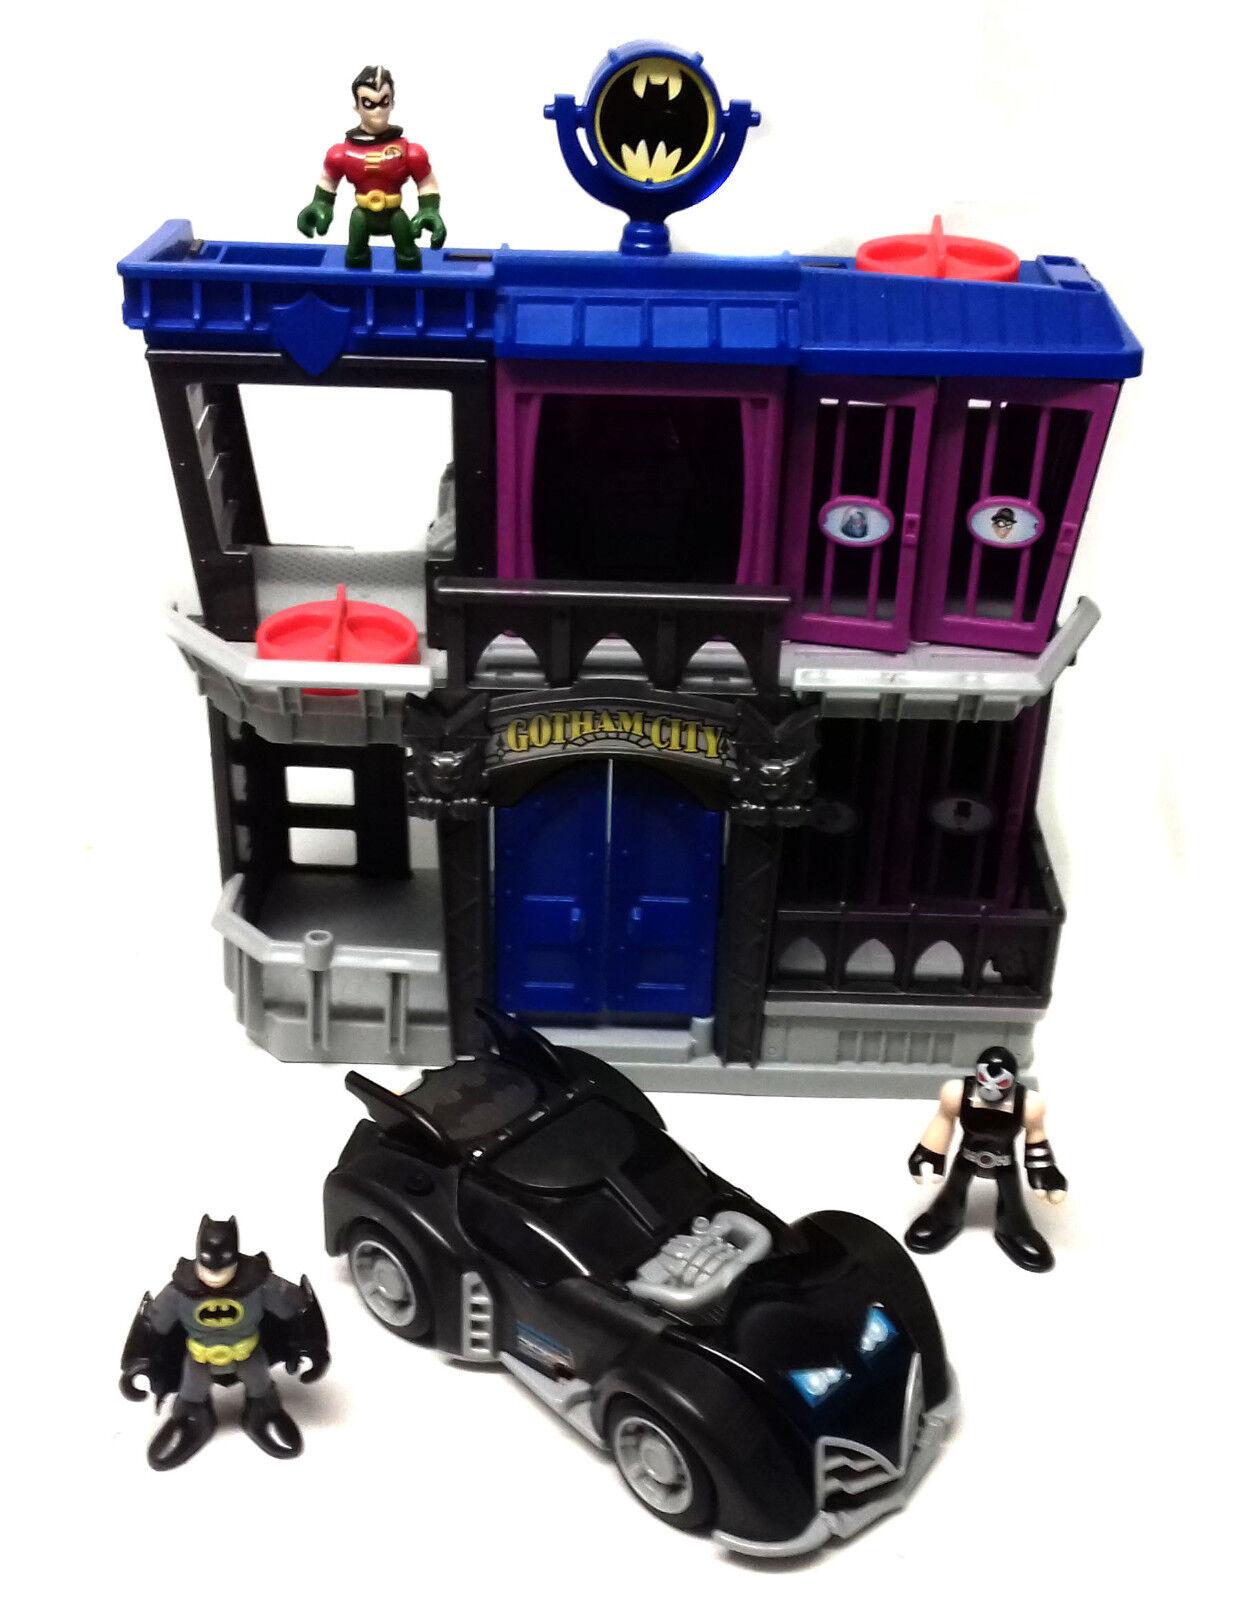 DC Fisher Price toys IMAGINEXT BATMAN GOTHAM JAIL  Toy Figures & vehicle set